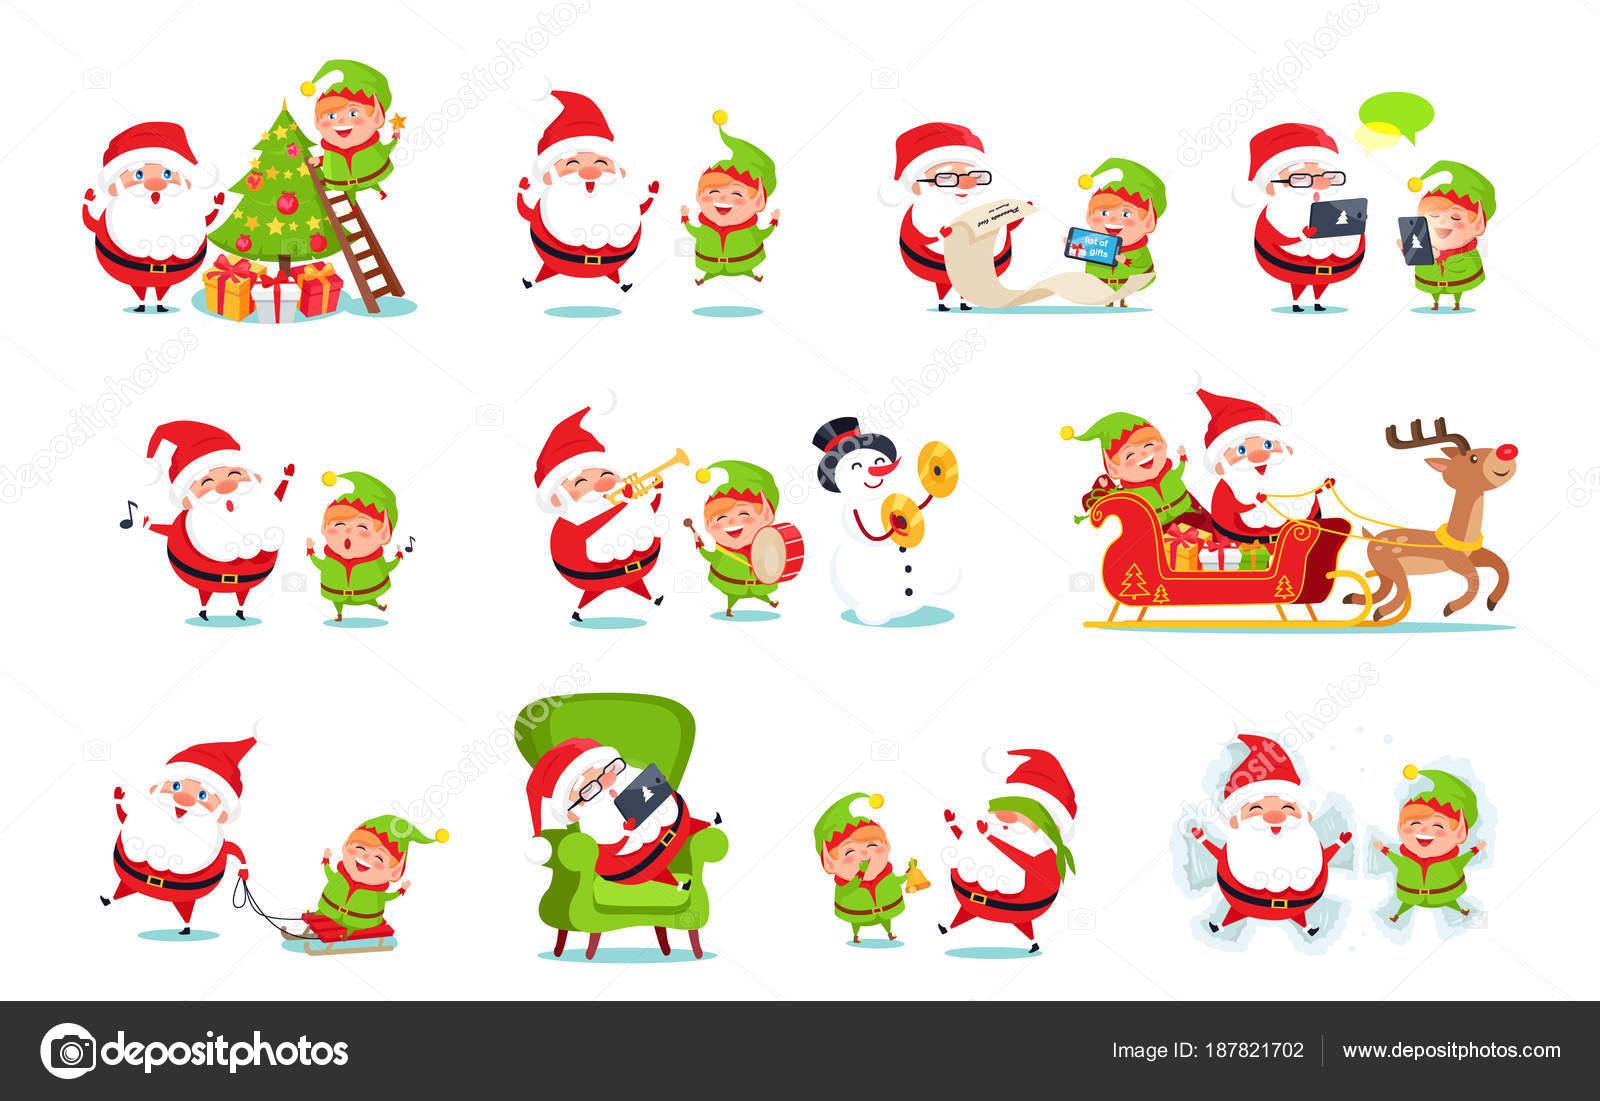 santa claus activities set vector illustration stock vector - Santa Claus Activities